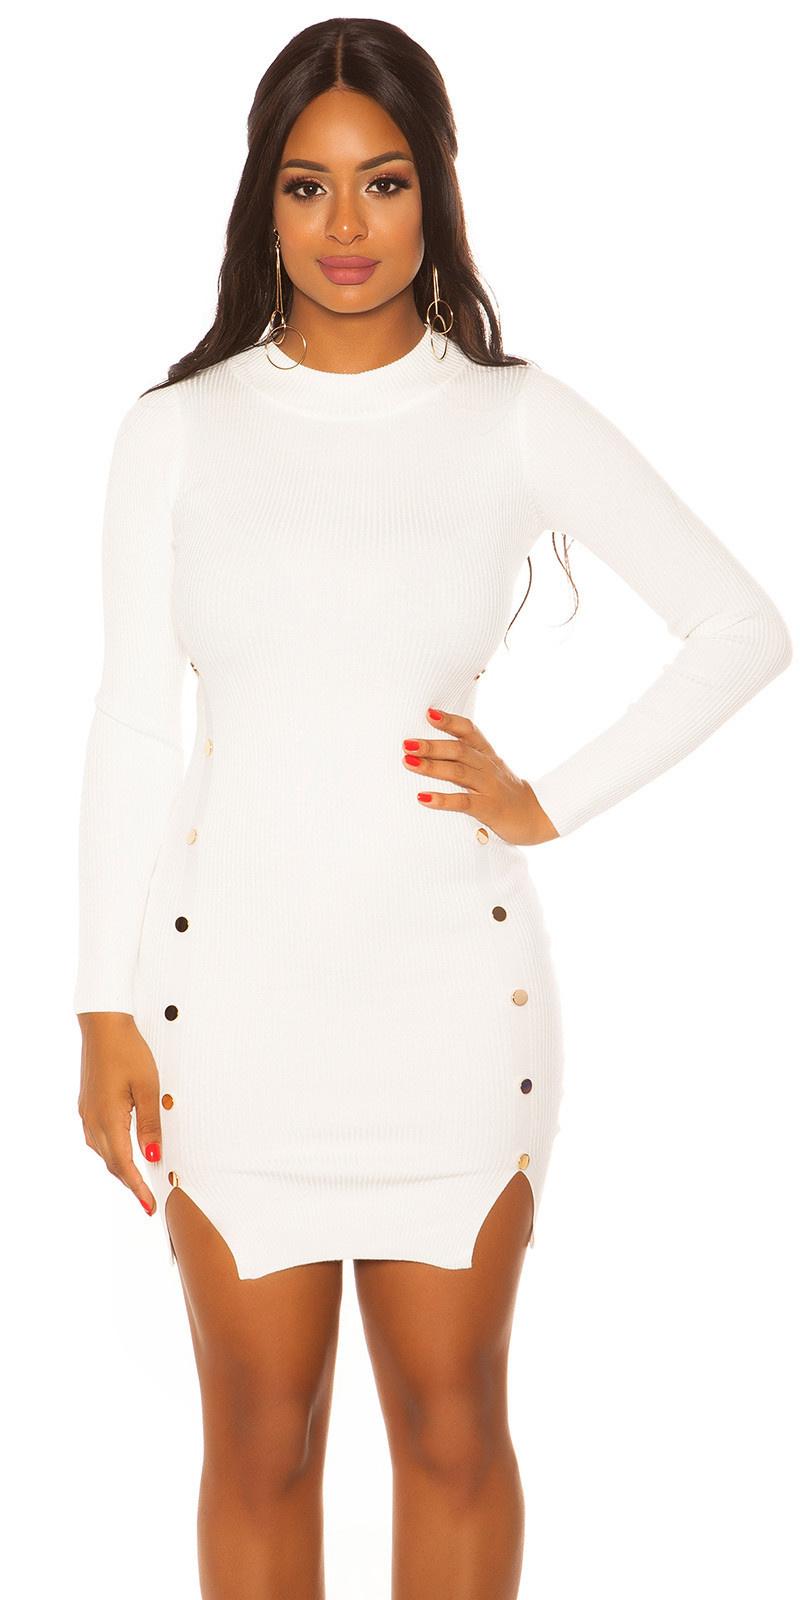 Sexy lange mouw gebreide jurk wit